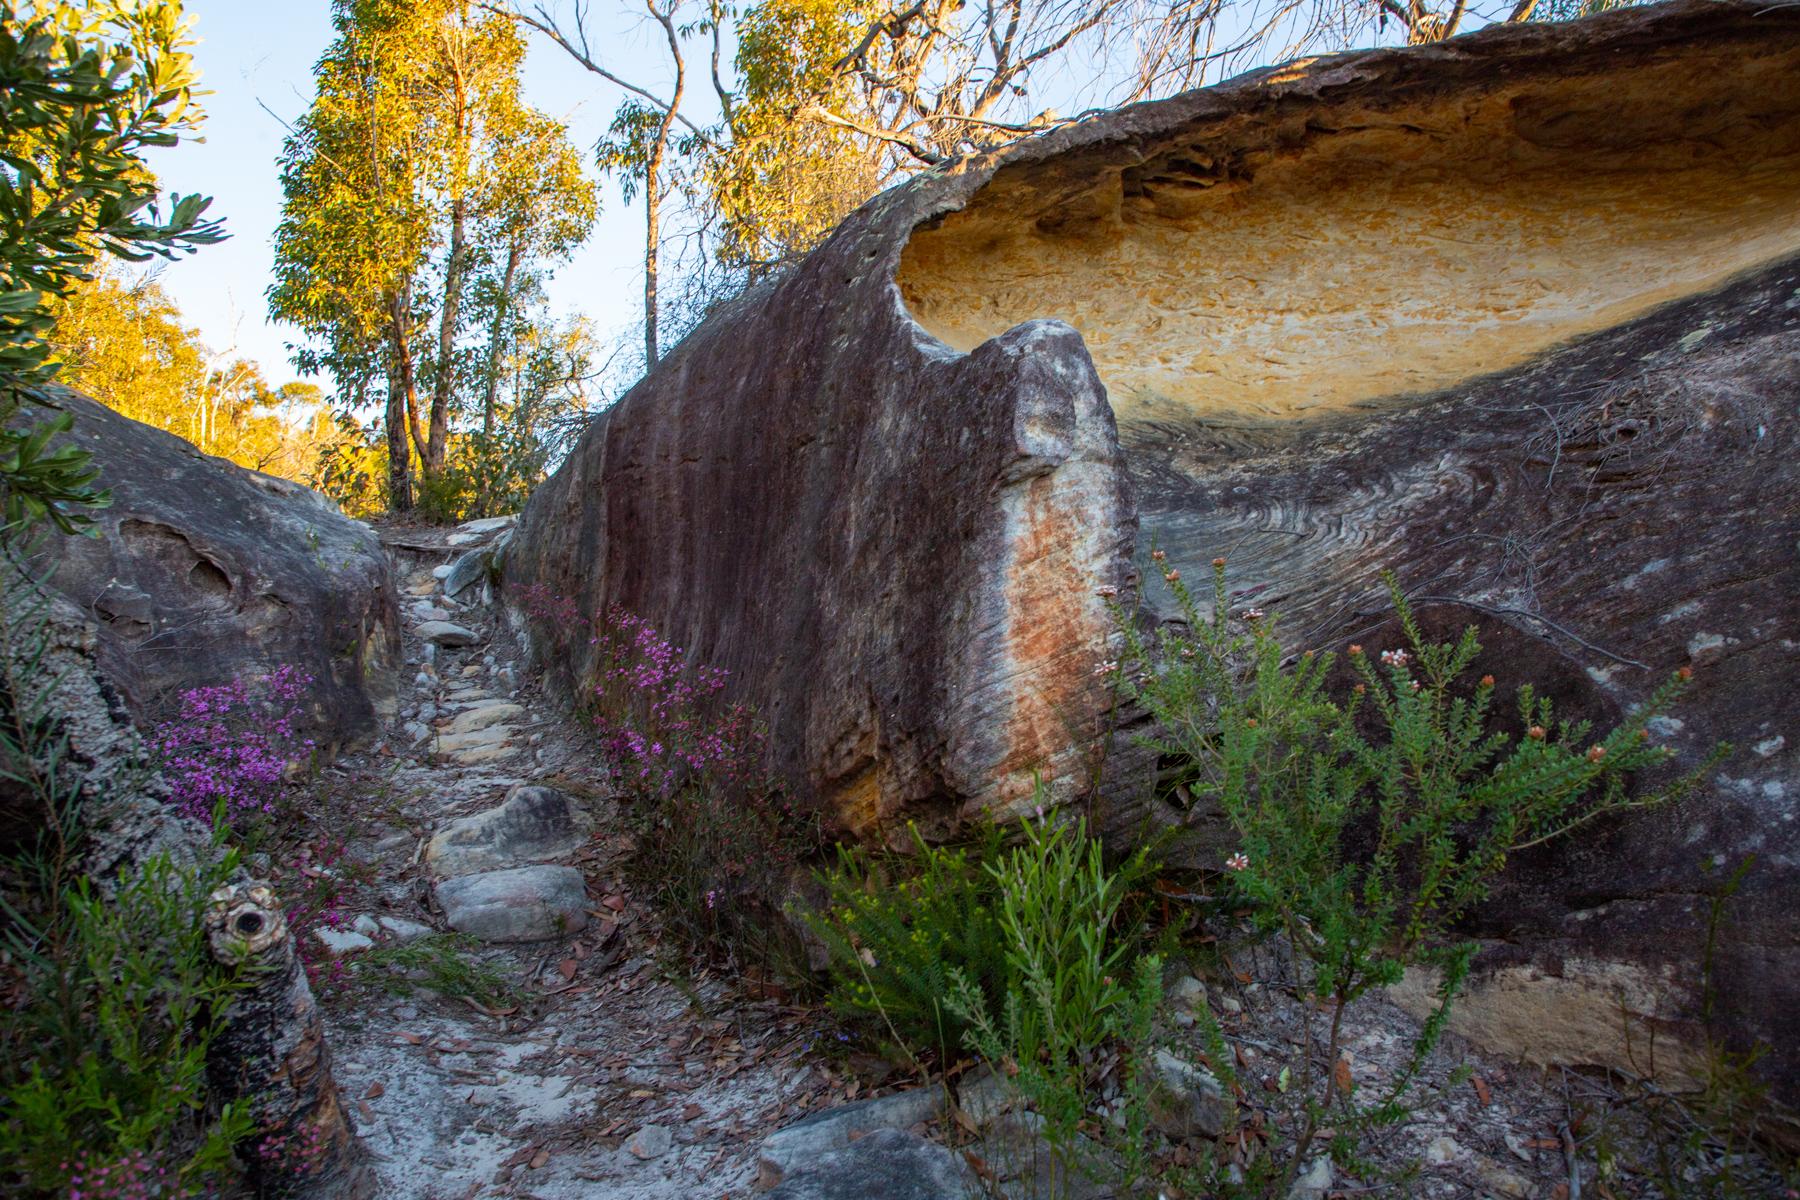 img 6717 lr Heath Trail and Bare Creek Loop (Garigal NP)